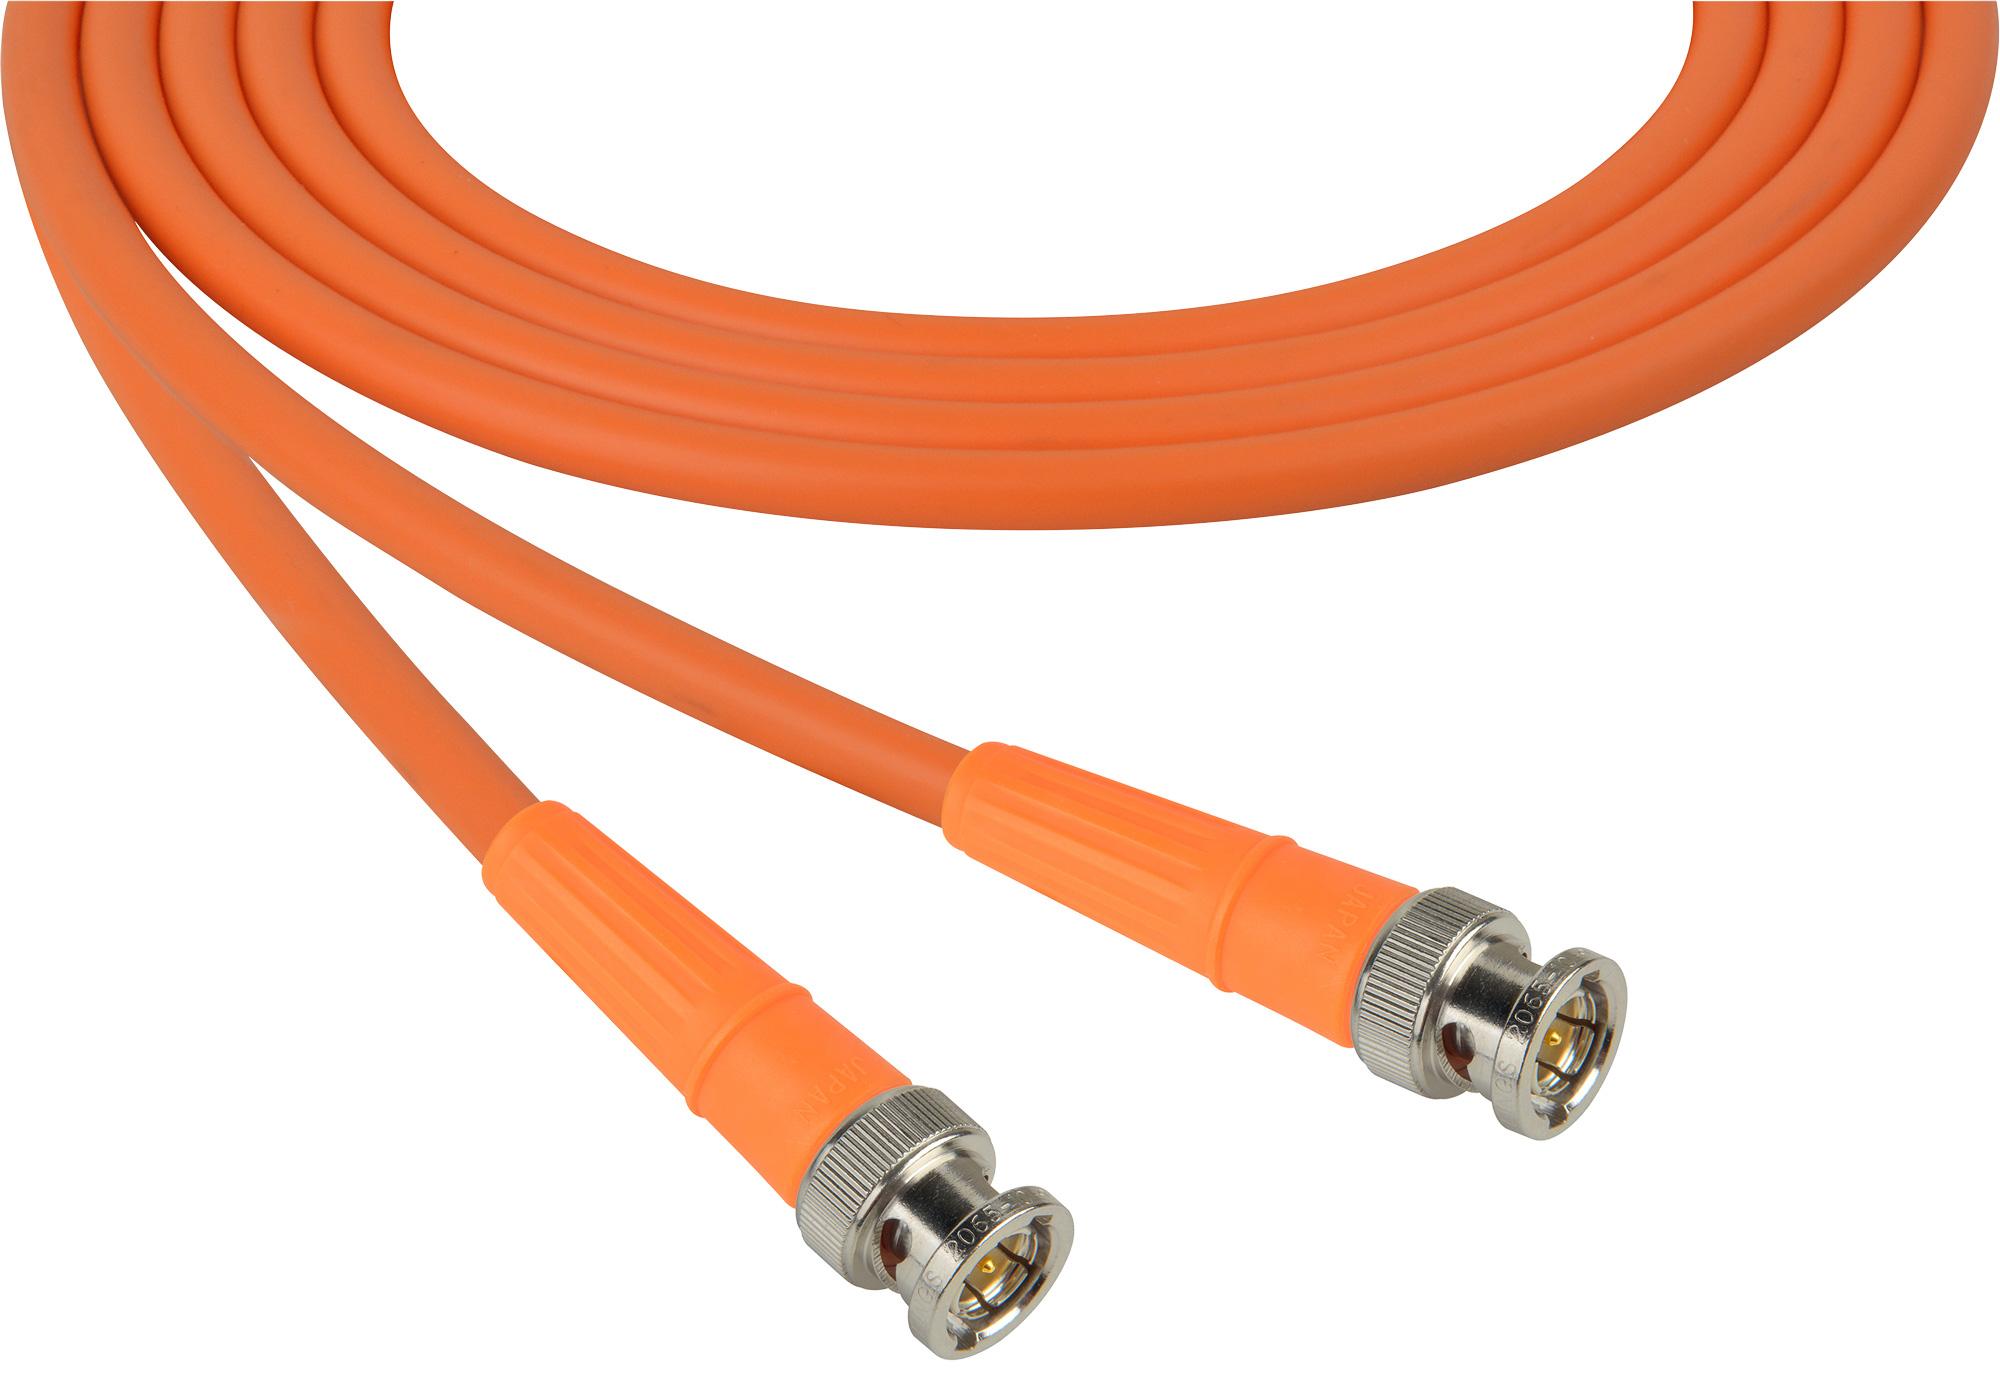 Belden 1694a Sdi Hdtv Rg6 Bnc Cable 6ft Orange